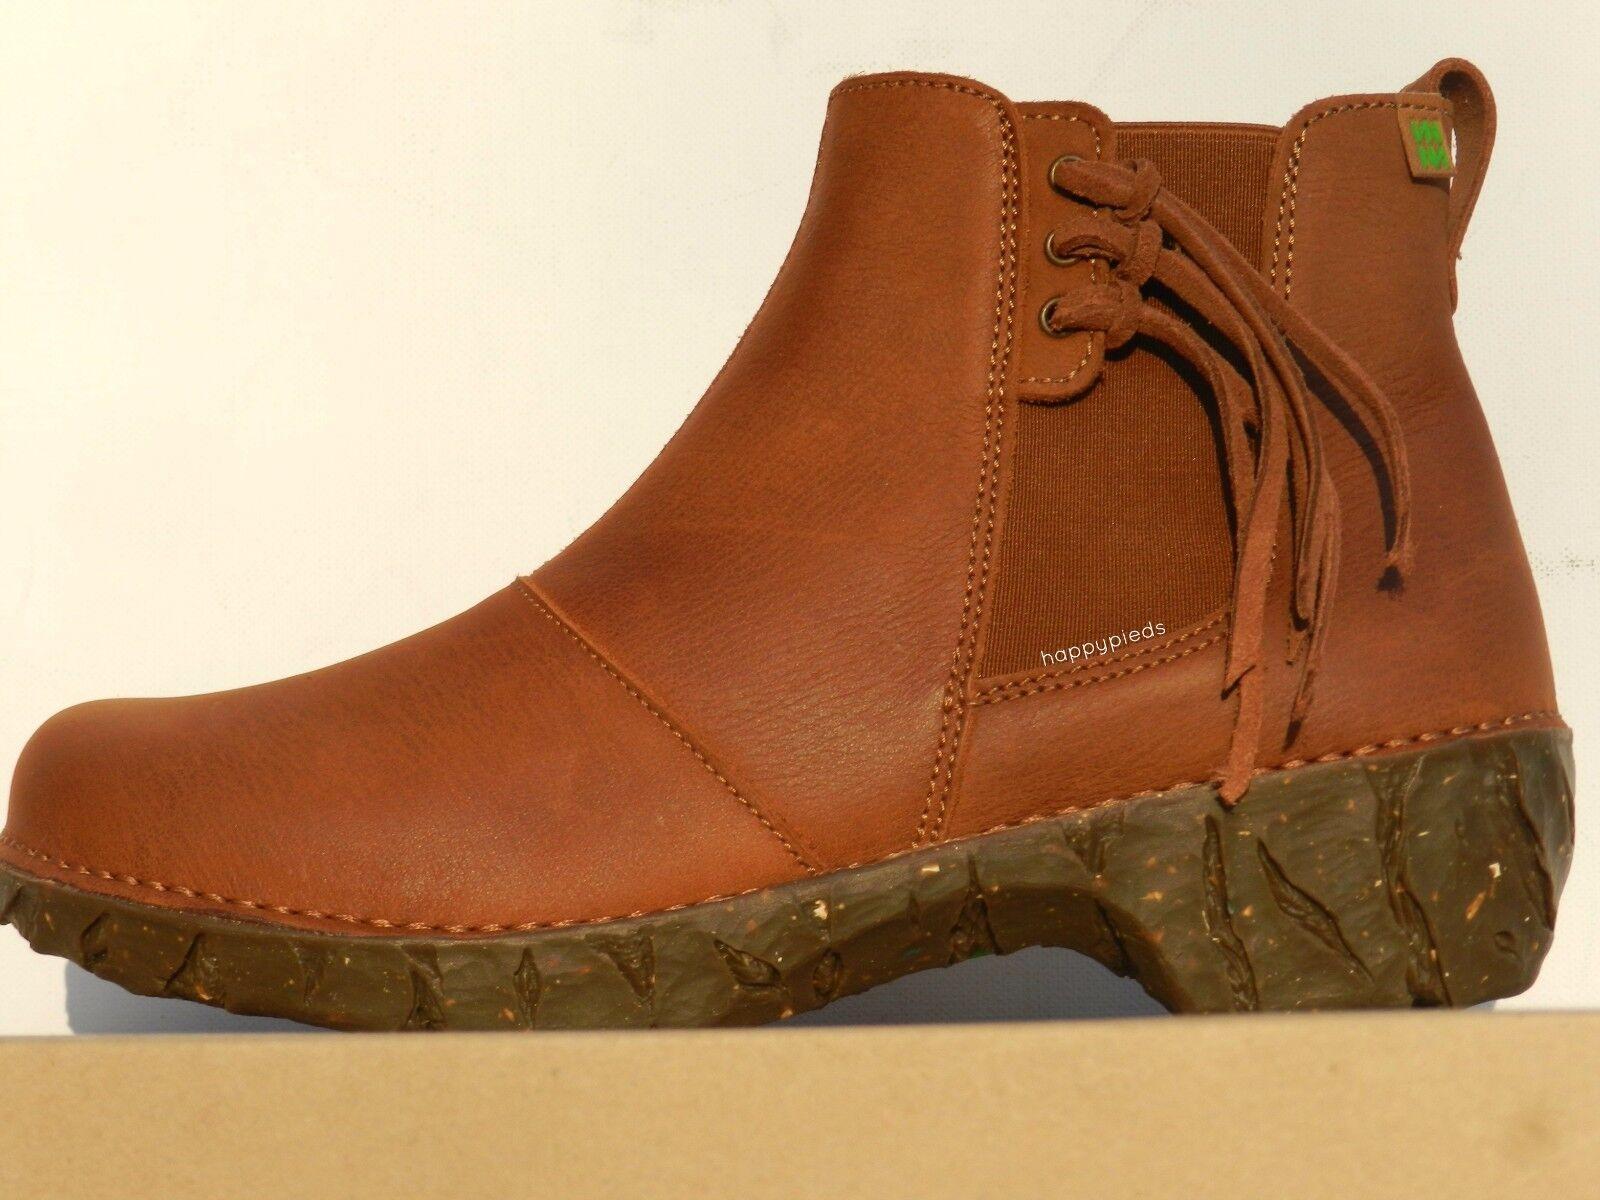 El Naturalista Yggdrasil NF97 shoes Femme 40 Bottines Bottes Pleasant Neuf